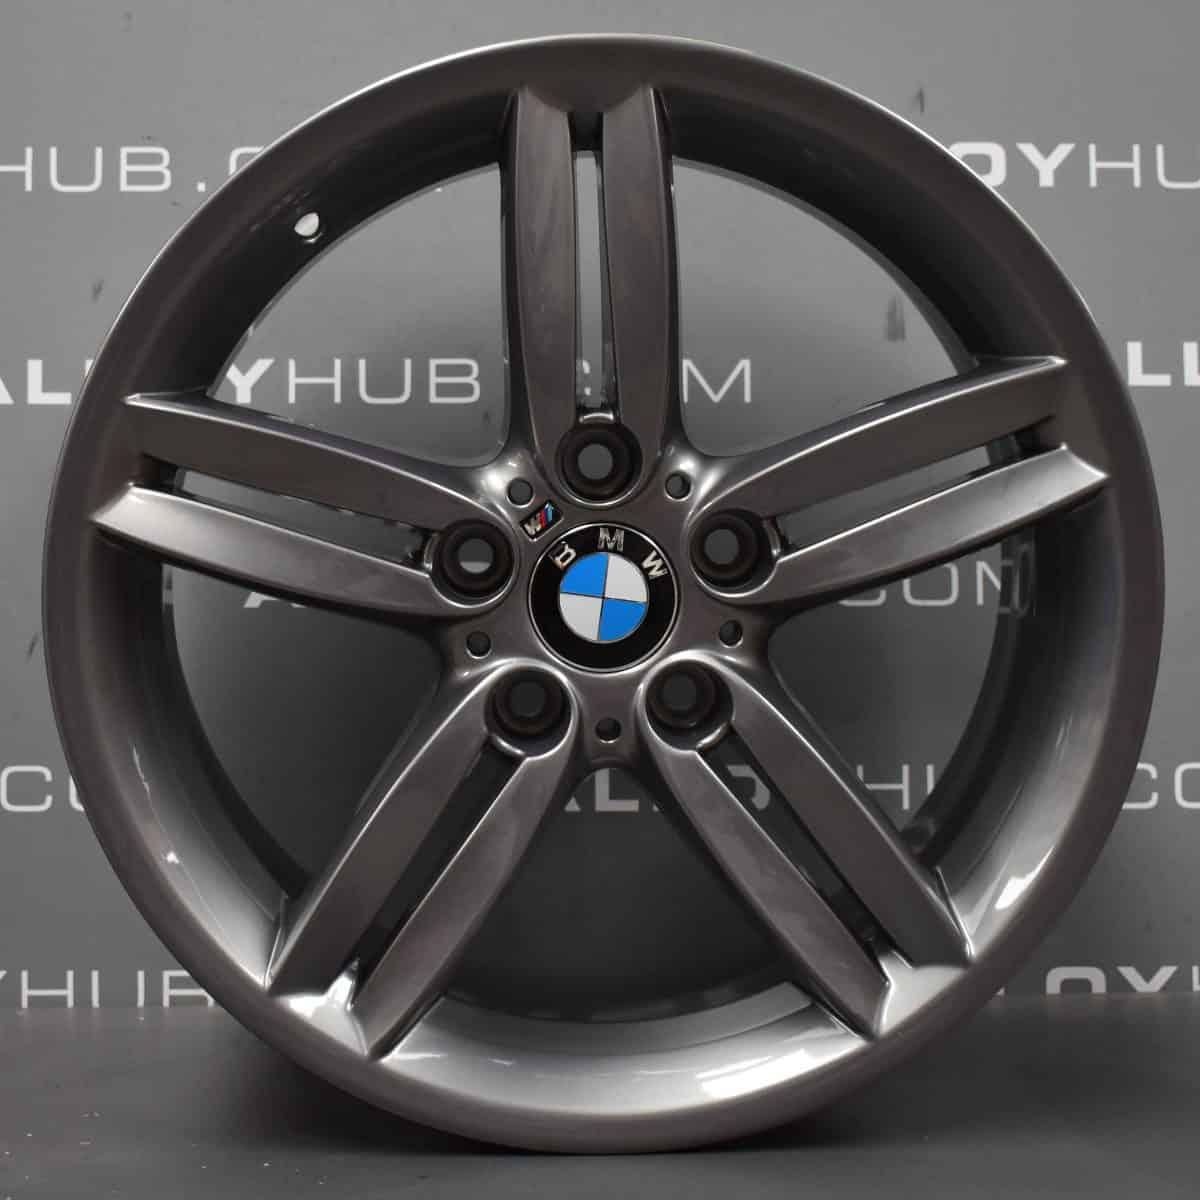 "Genuine BMW 1 Series 208M Sport 5 Twin Spoke 18"" Inch Alloy Wheels with Ferric Grey 36118036939 36117839305"